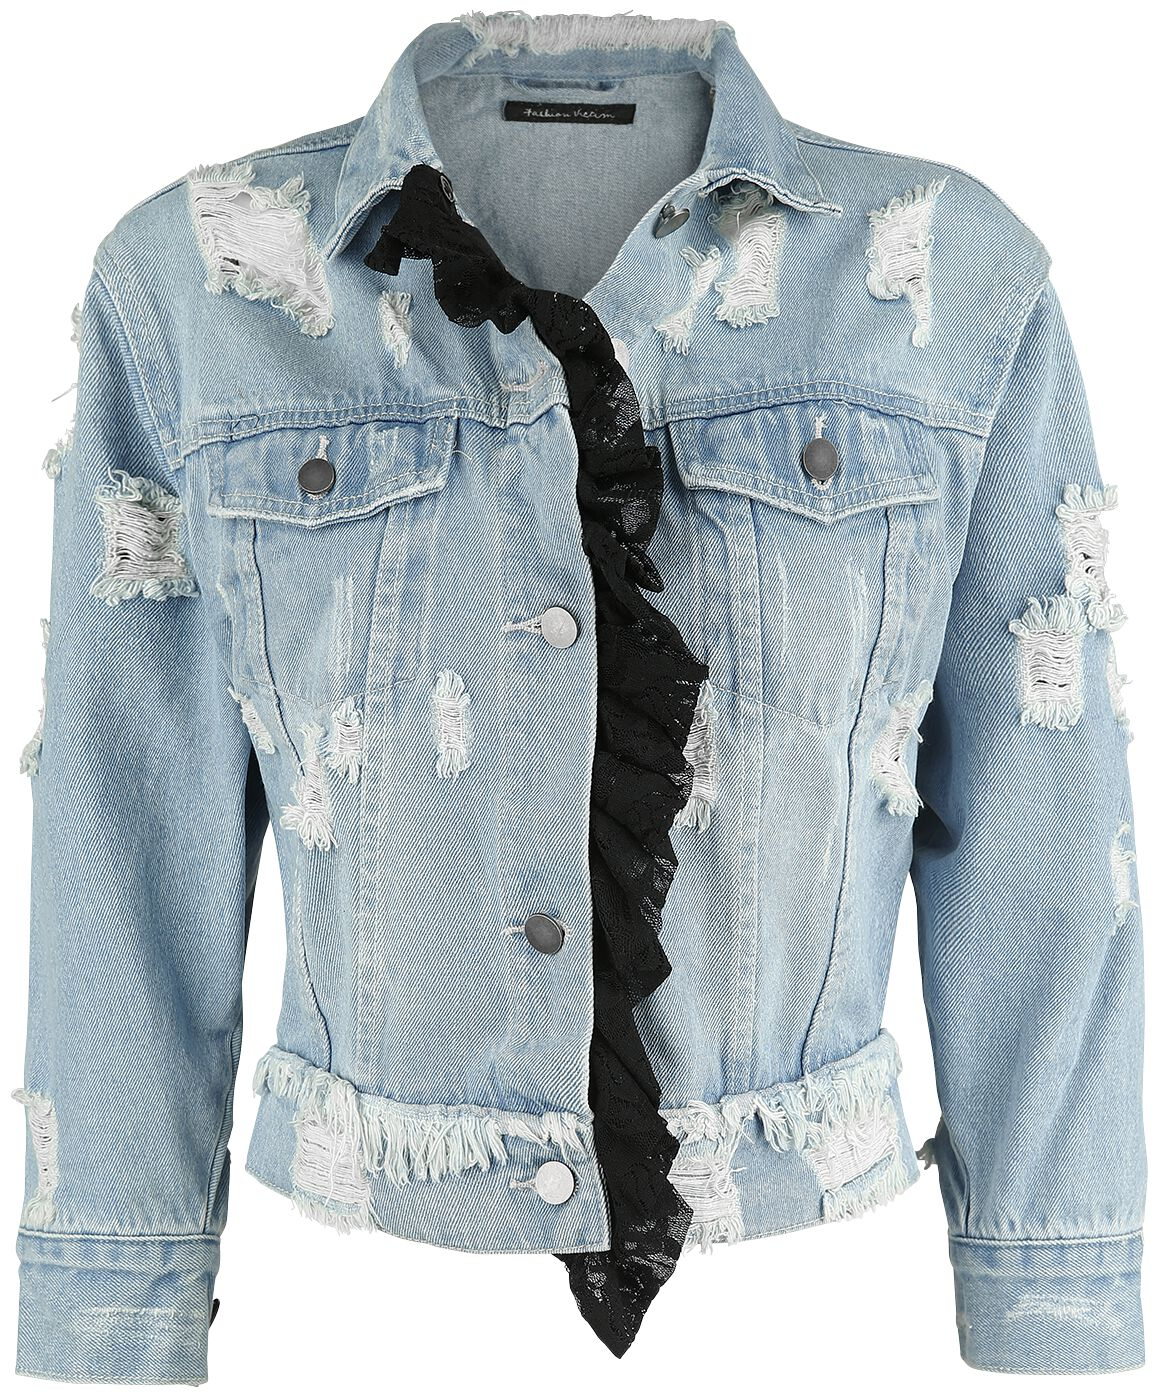 Fashion Victim Jeansjacke mit Destroyed Effekt Kurtka jeansowa damska niebieski